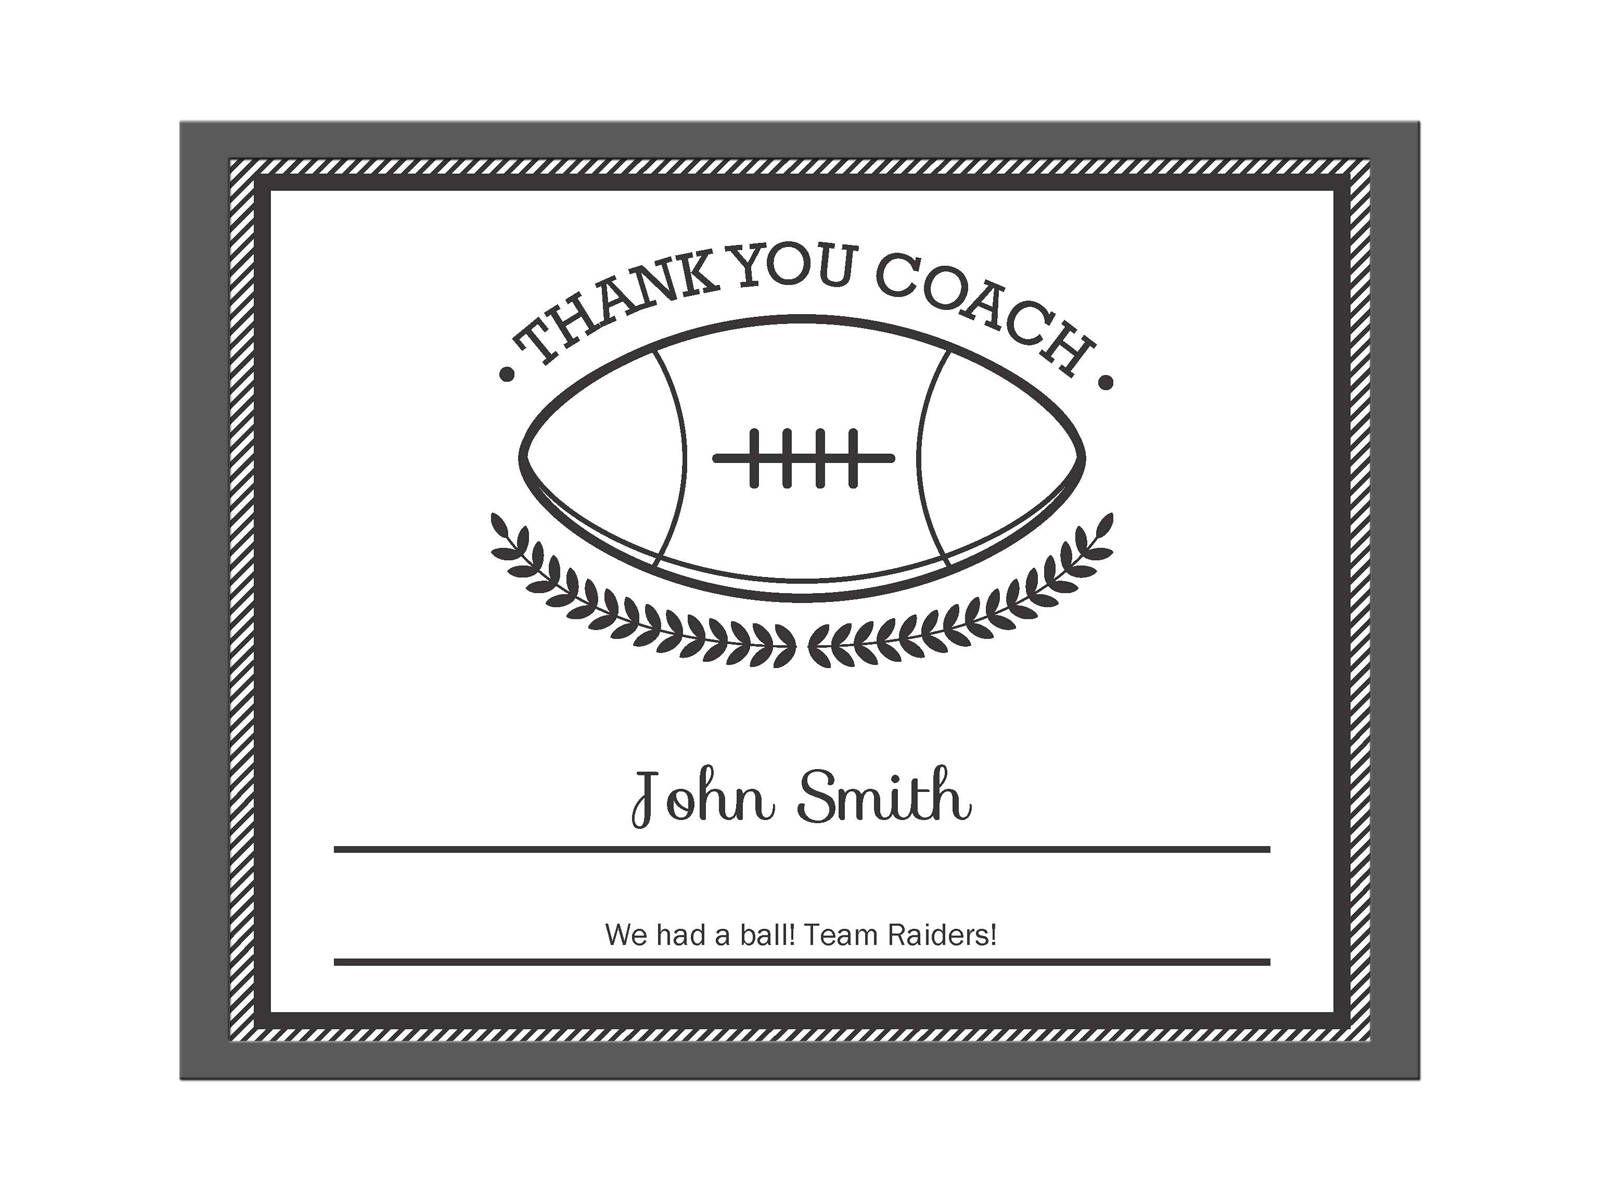 Editable Pdf Sports Team Football Thank You Coach Certificate Award